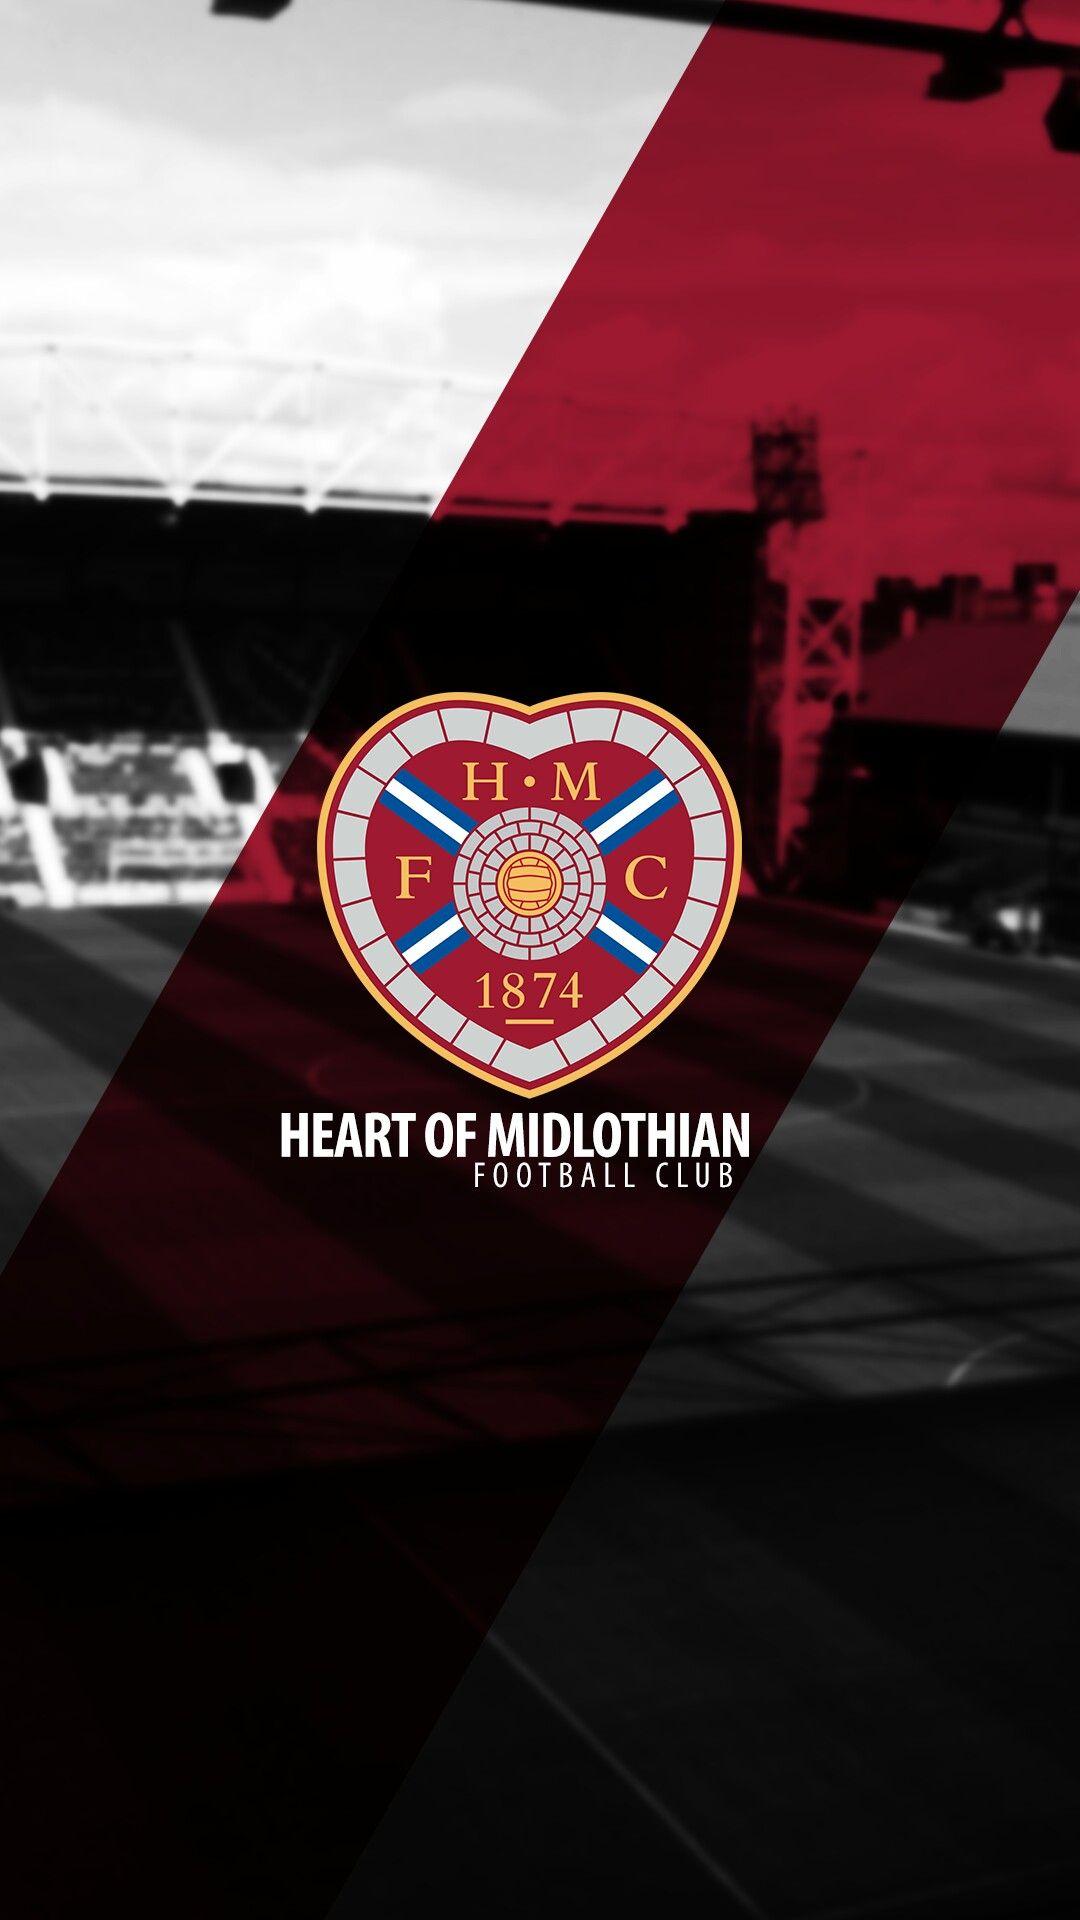 Pin By Ritab1 On Heart Of Midlothian Football Club Team Wallpaper Football Club Soccer Team